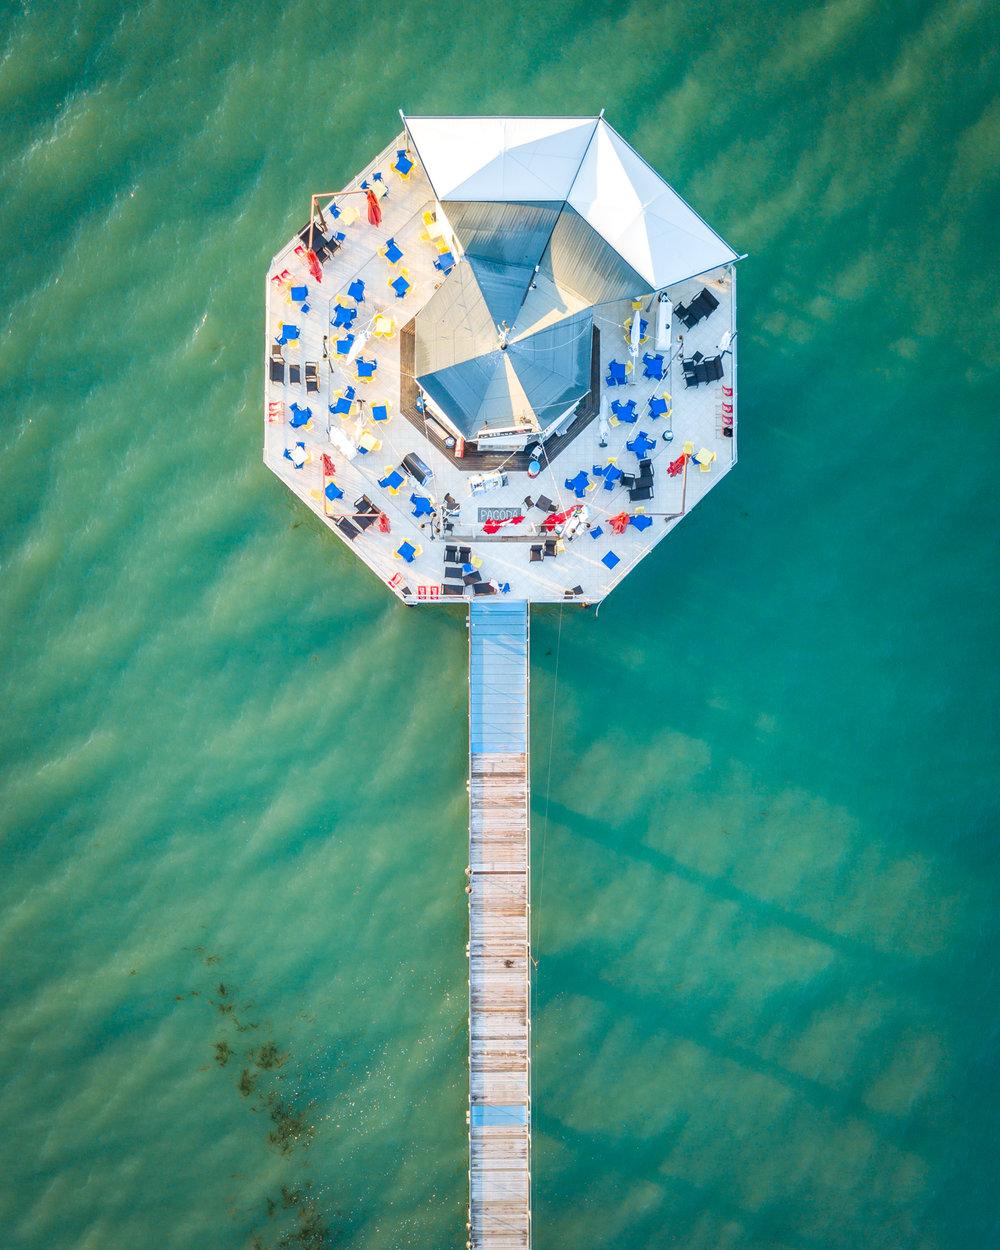 Lignano Pier - Lignano Sabbiadoro, Italy